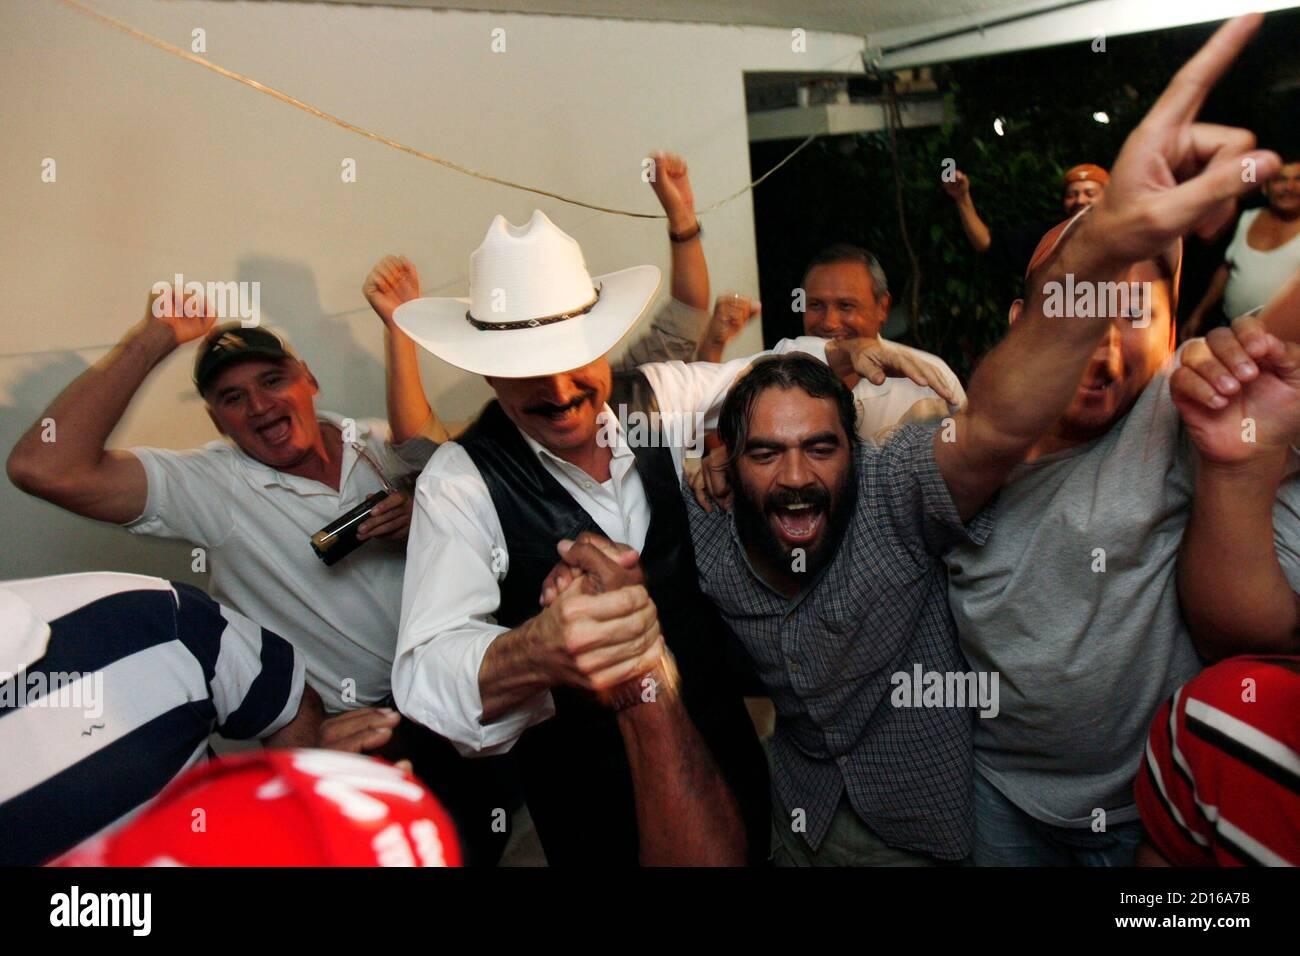 Ousted Honduras' President Manuel Zelaya (C) celebrates with supporters after Honduras' 2010 World Cup qualifying match victory over El Salvador, inside the Brazilian embassy in Tegucigalpa October 14, 2009. REUTERS/Edgard Garrido (HONDURAS POLITICS SPORT) Foto Stock